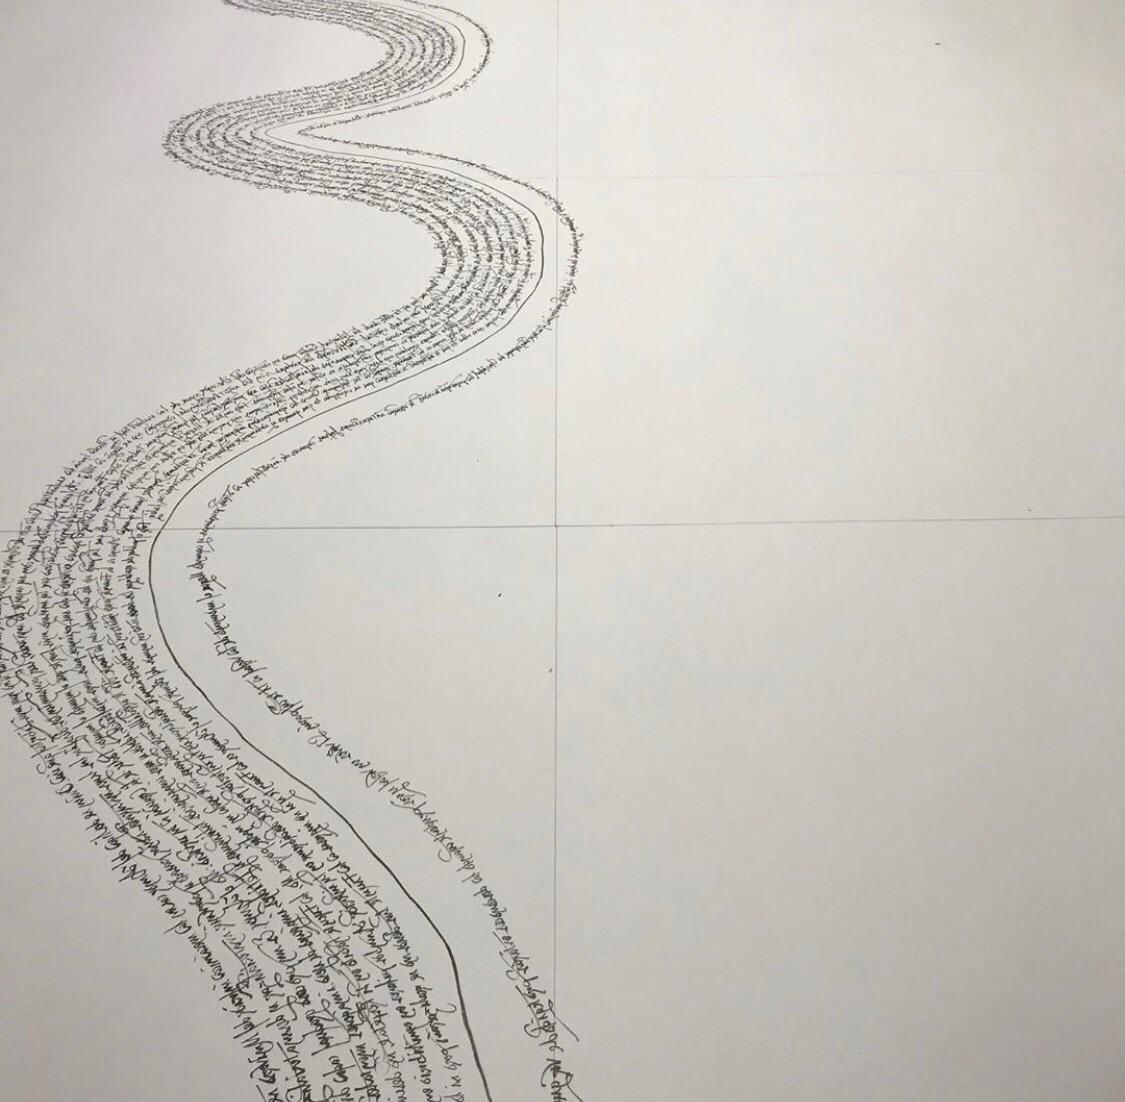 Descubre la obra del artista Gonzalo Páramo